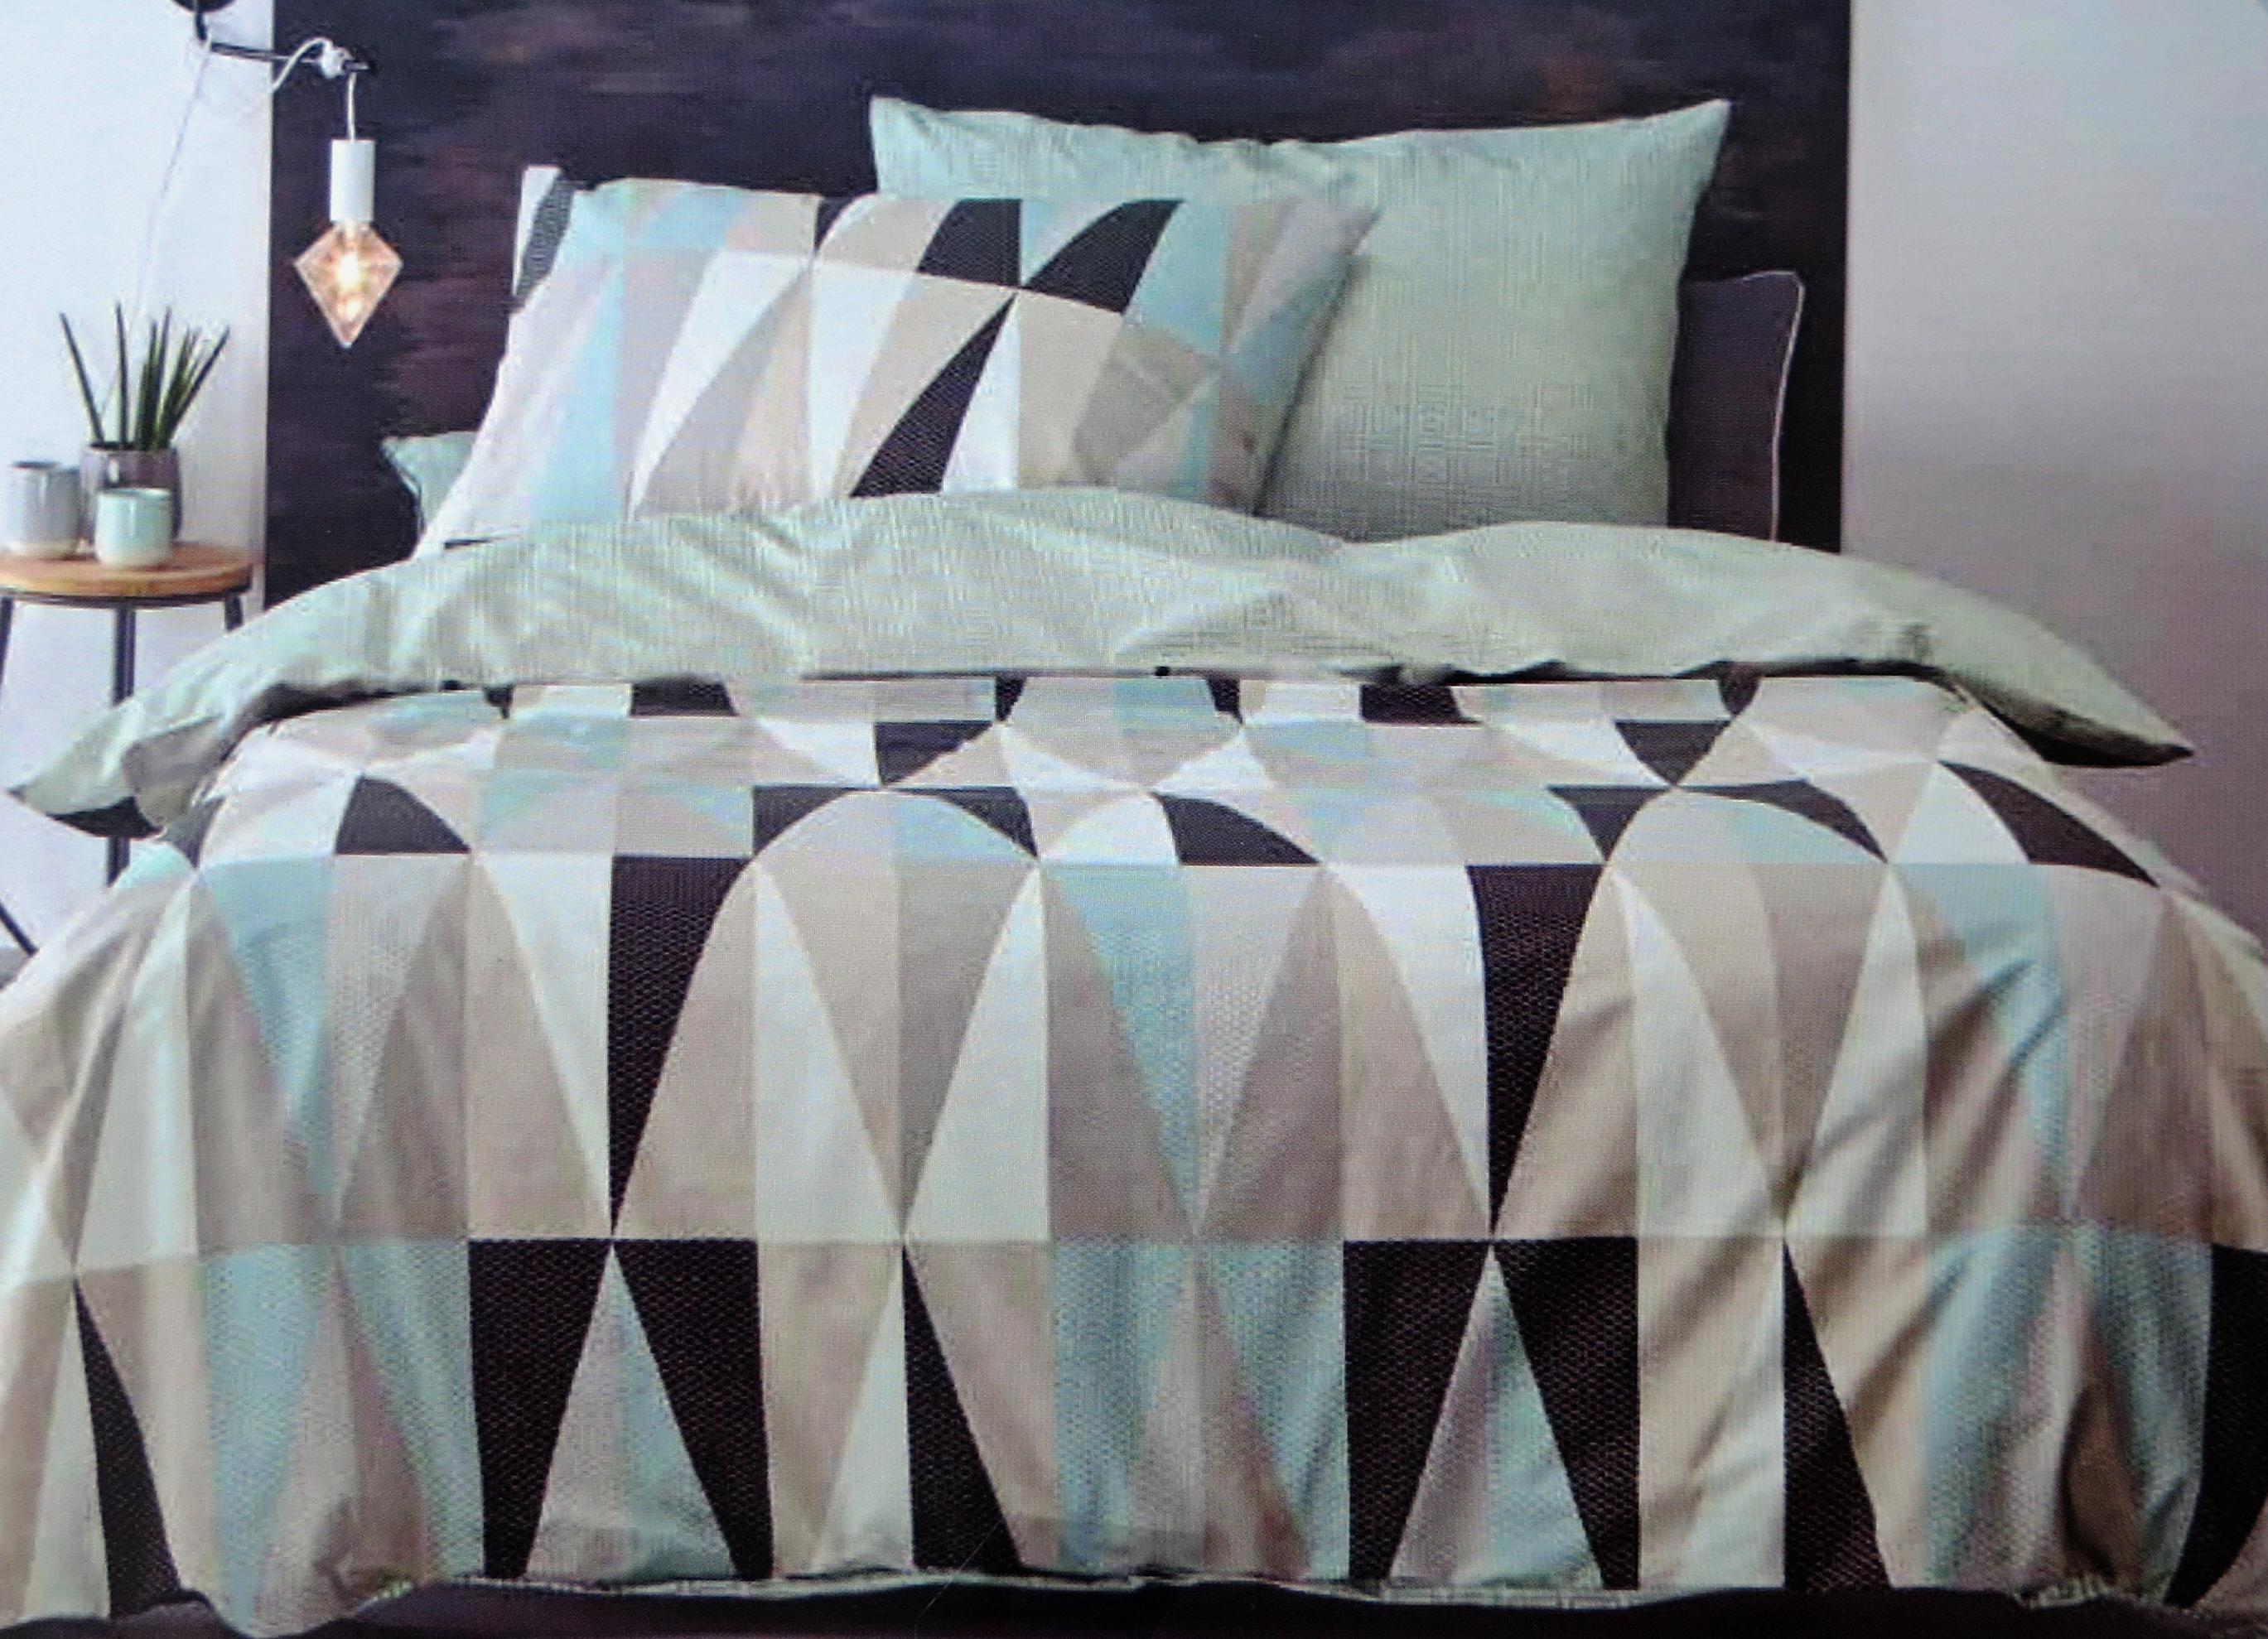 2tlg bettw sche 135 x200 i 155 x220 cm bettbezug. Black Bedroom Furniture Sets. Home Design Ideas